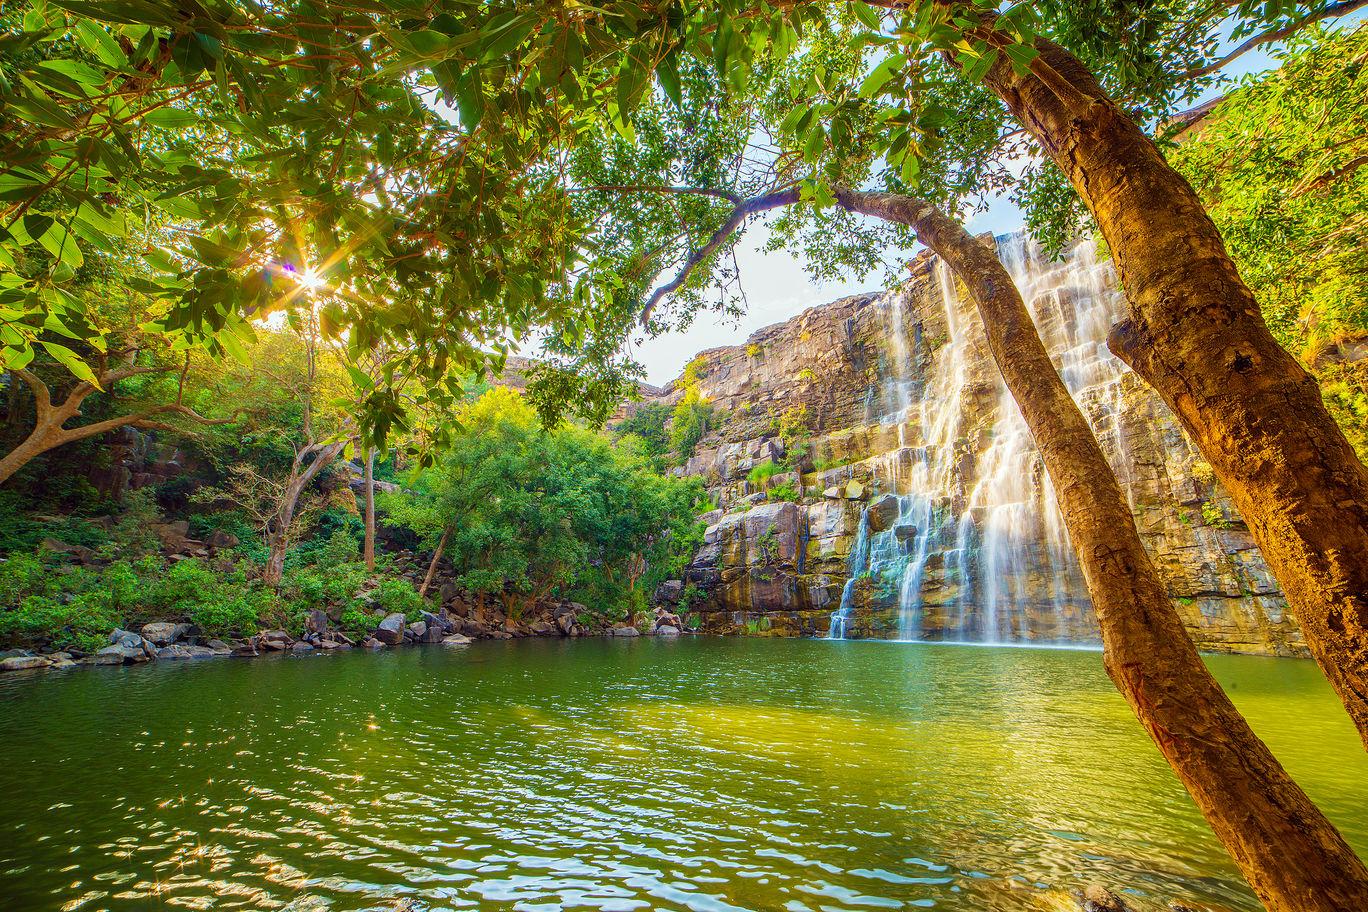 Photo of Bhimlat Mahadev Temple & Waterfall By Akash Kapri